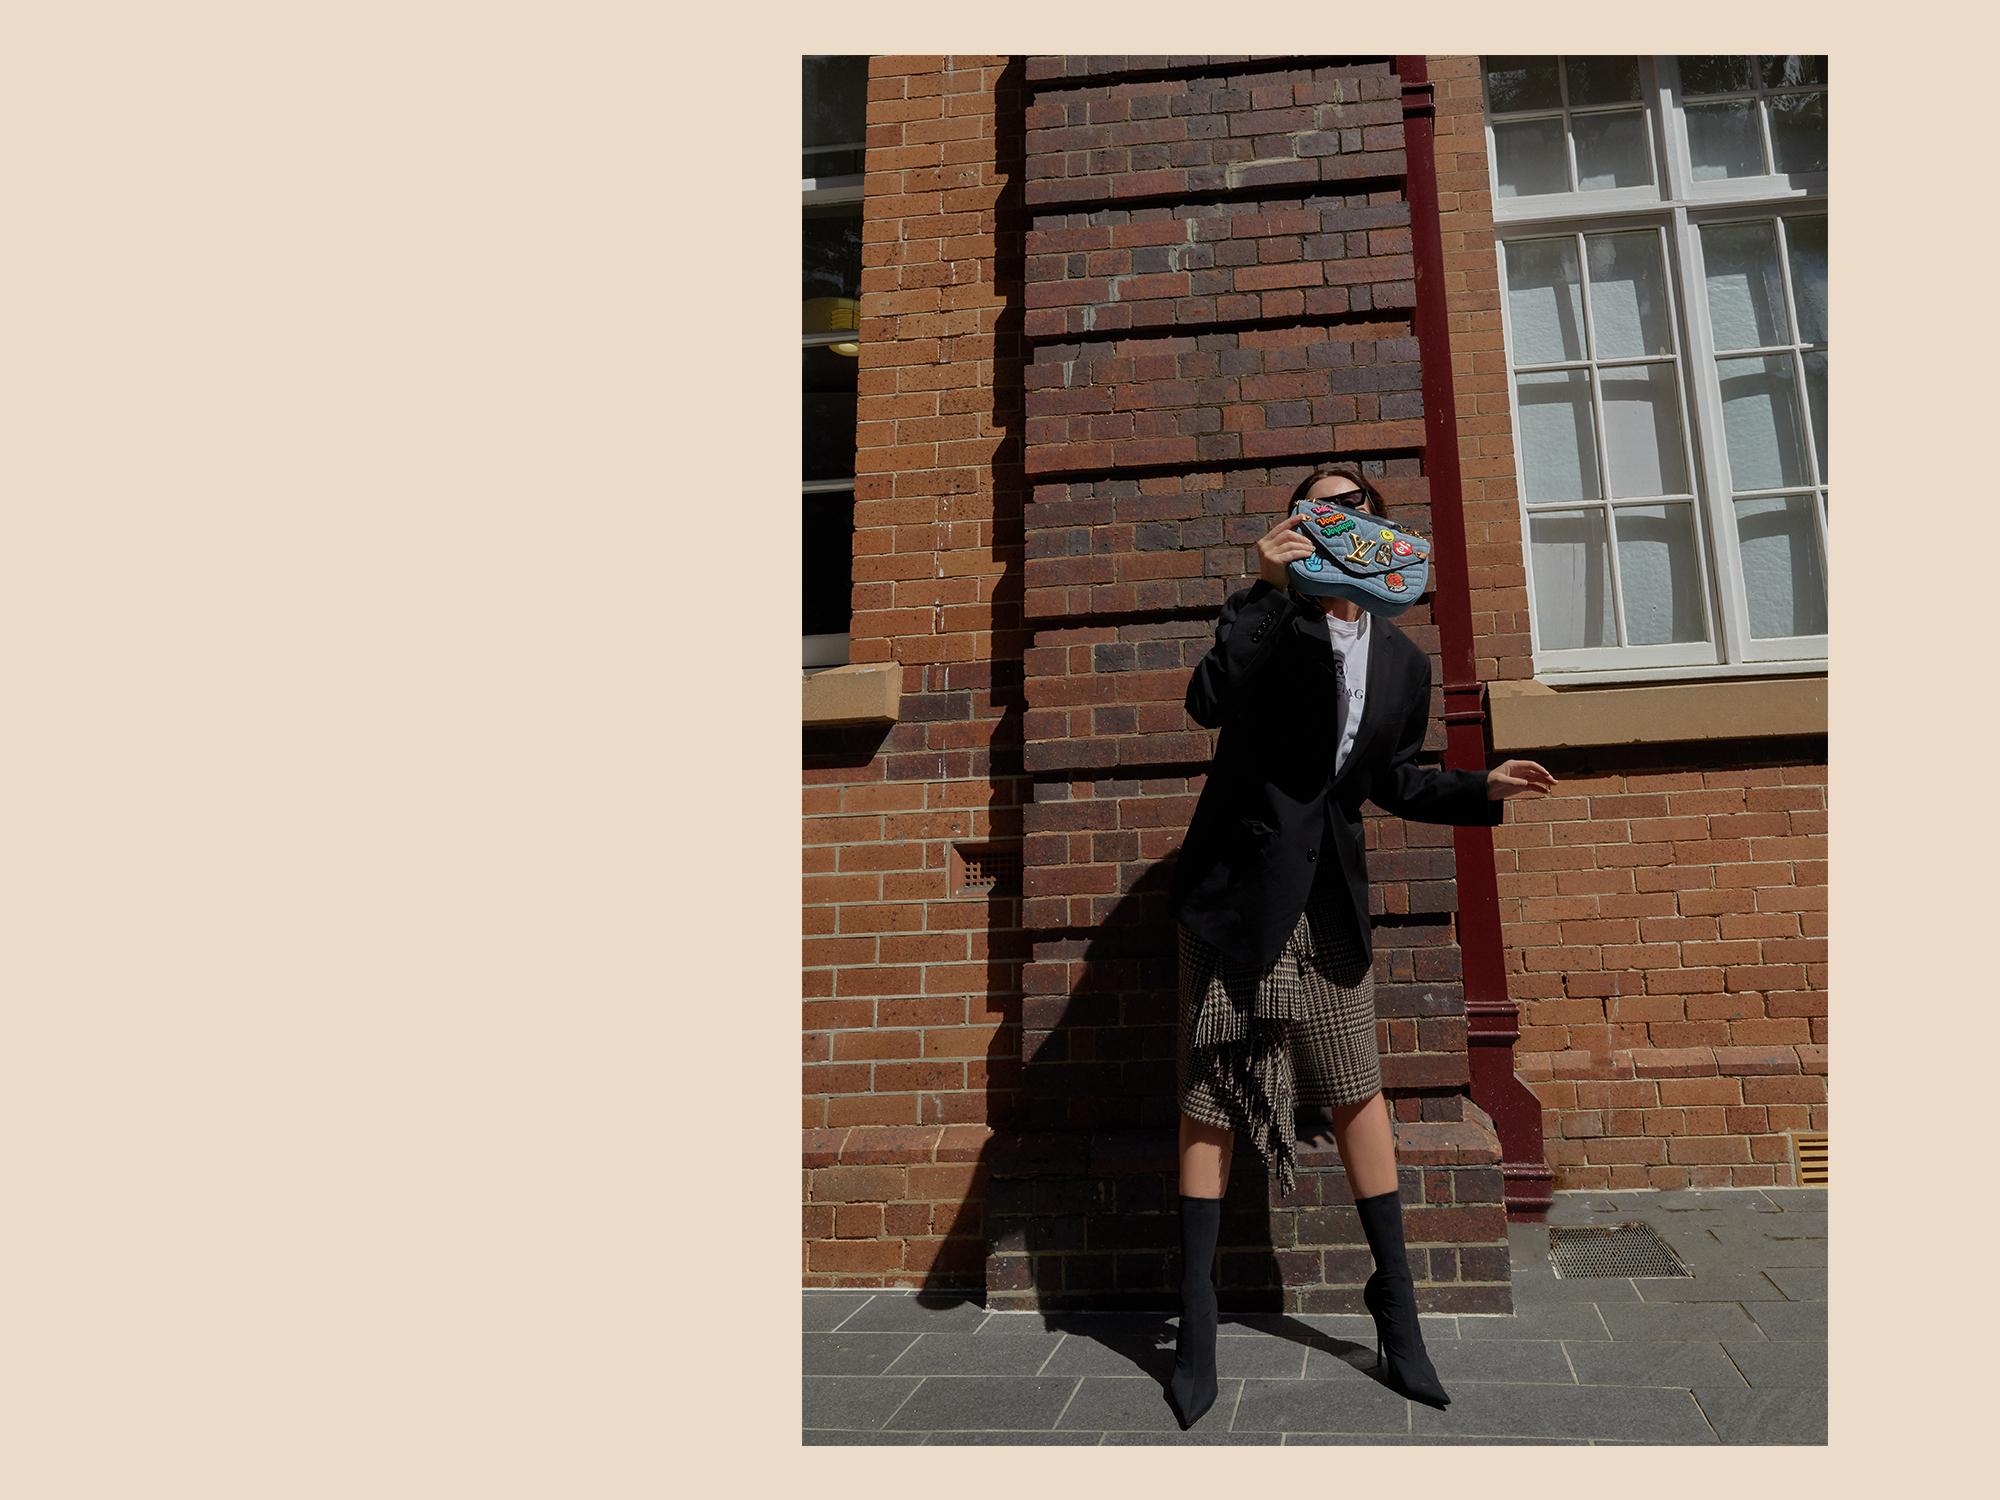 Balenciaga, Skirt, Tweed, Louis, Vuitton, Handbag, New, Wave, Denim, Outfit, Inspiration, Oracle Fox